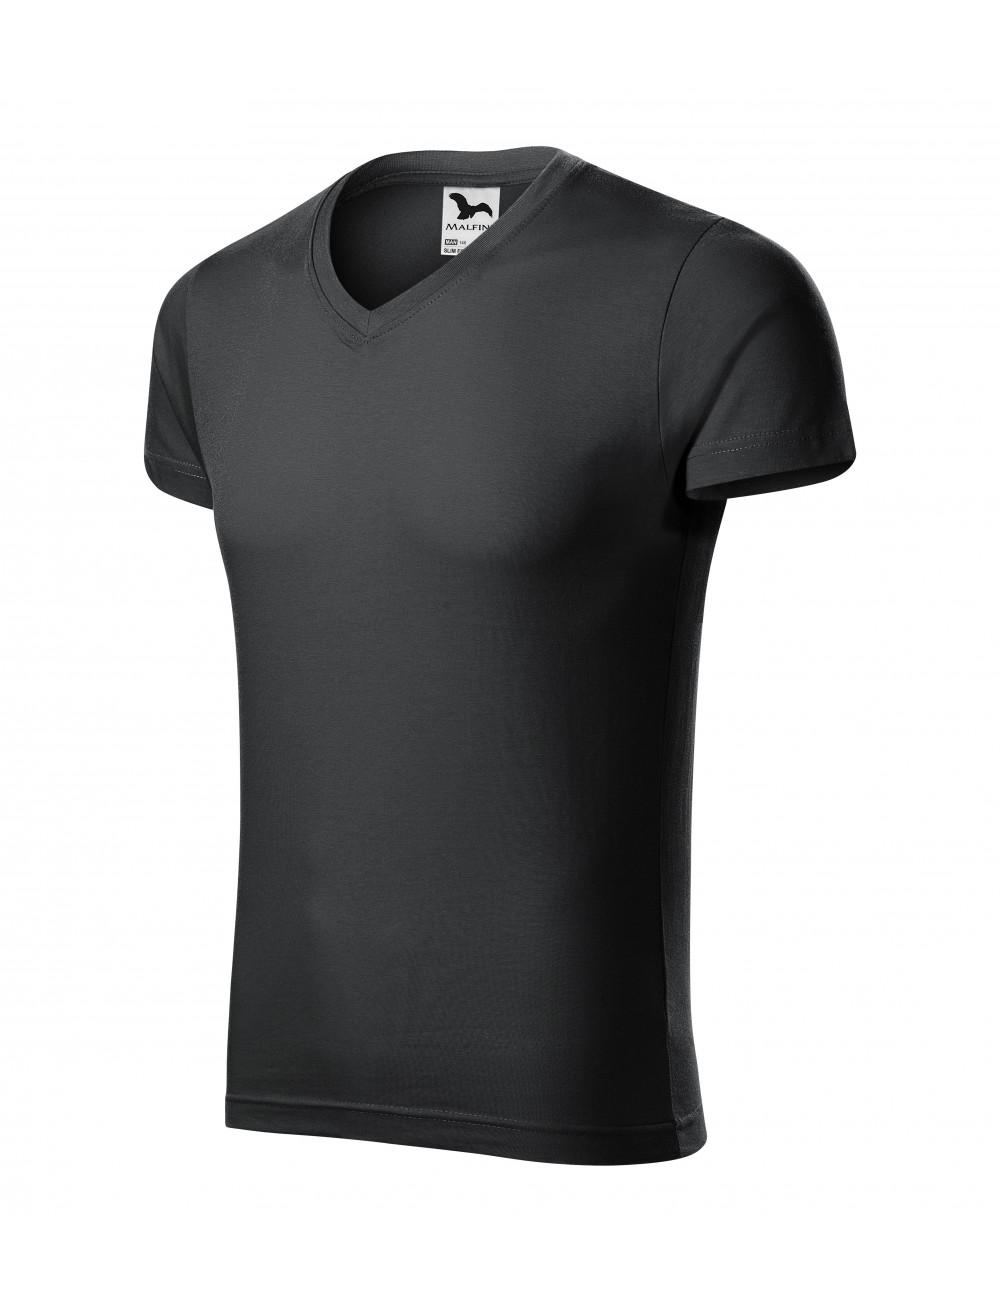 Adler MALFINI Koszulka męska Slim Fit V-neck 146 ebony gray